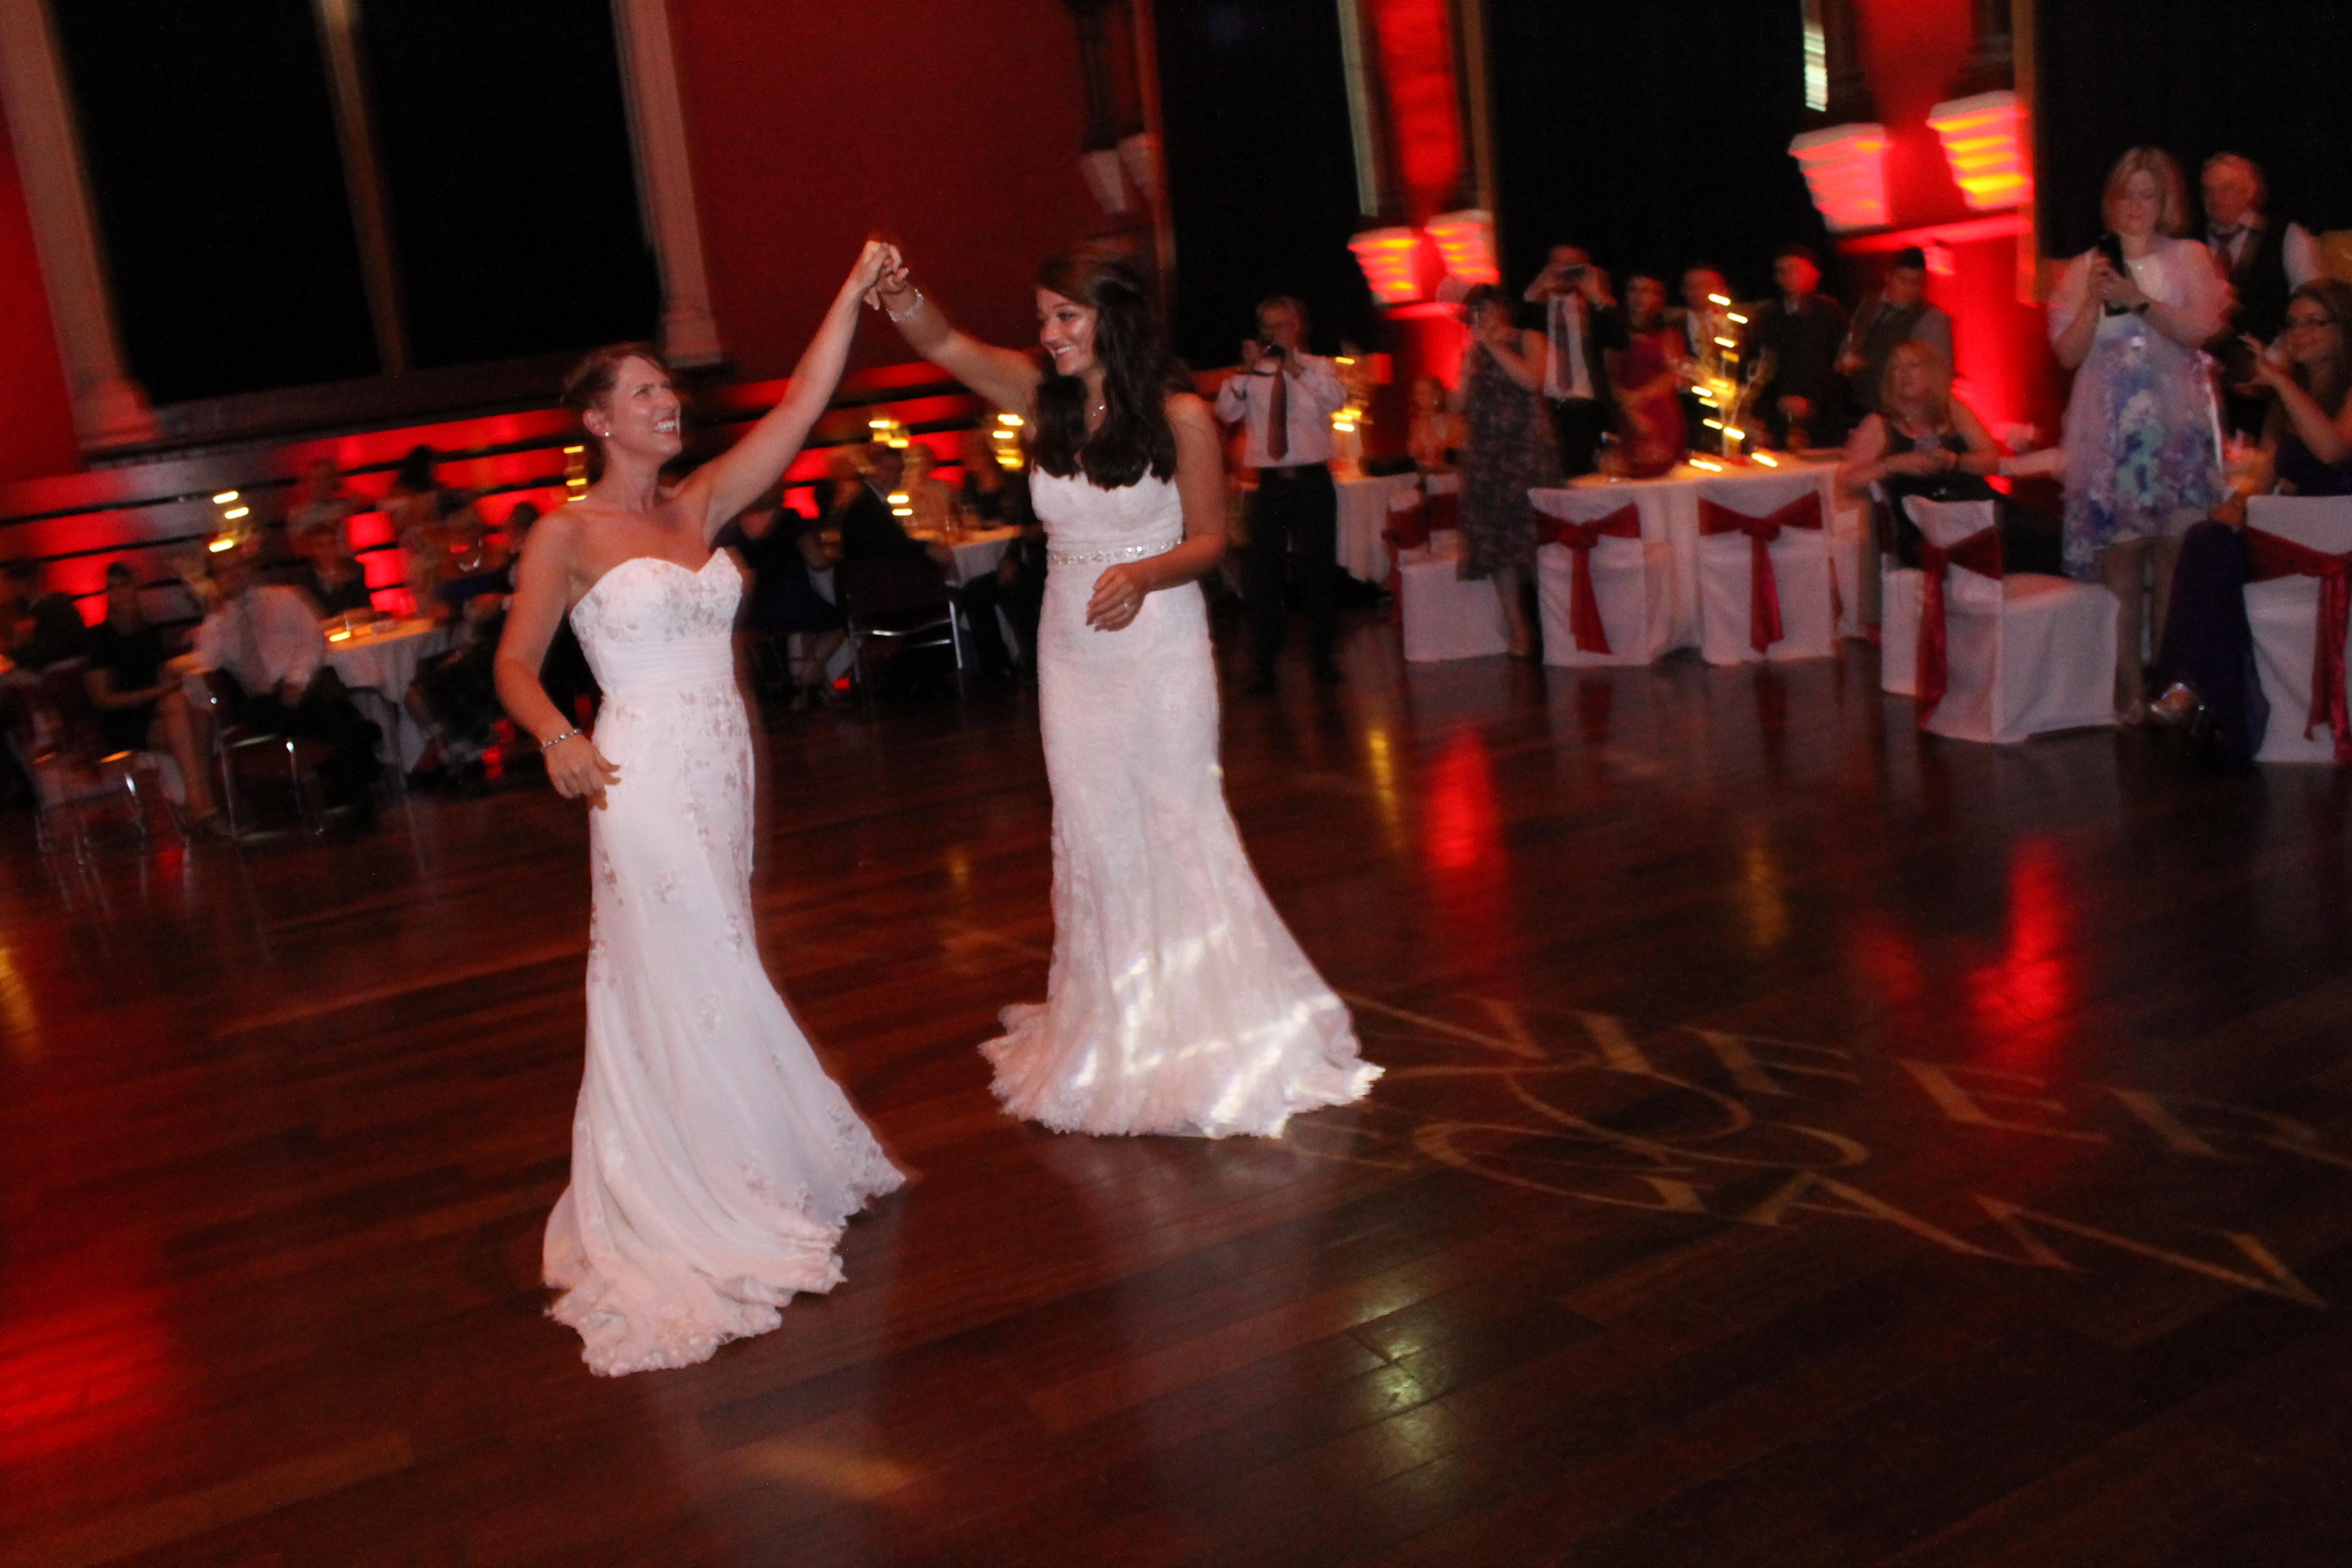 My Rutherglen brides